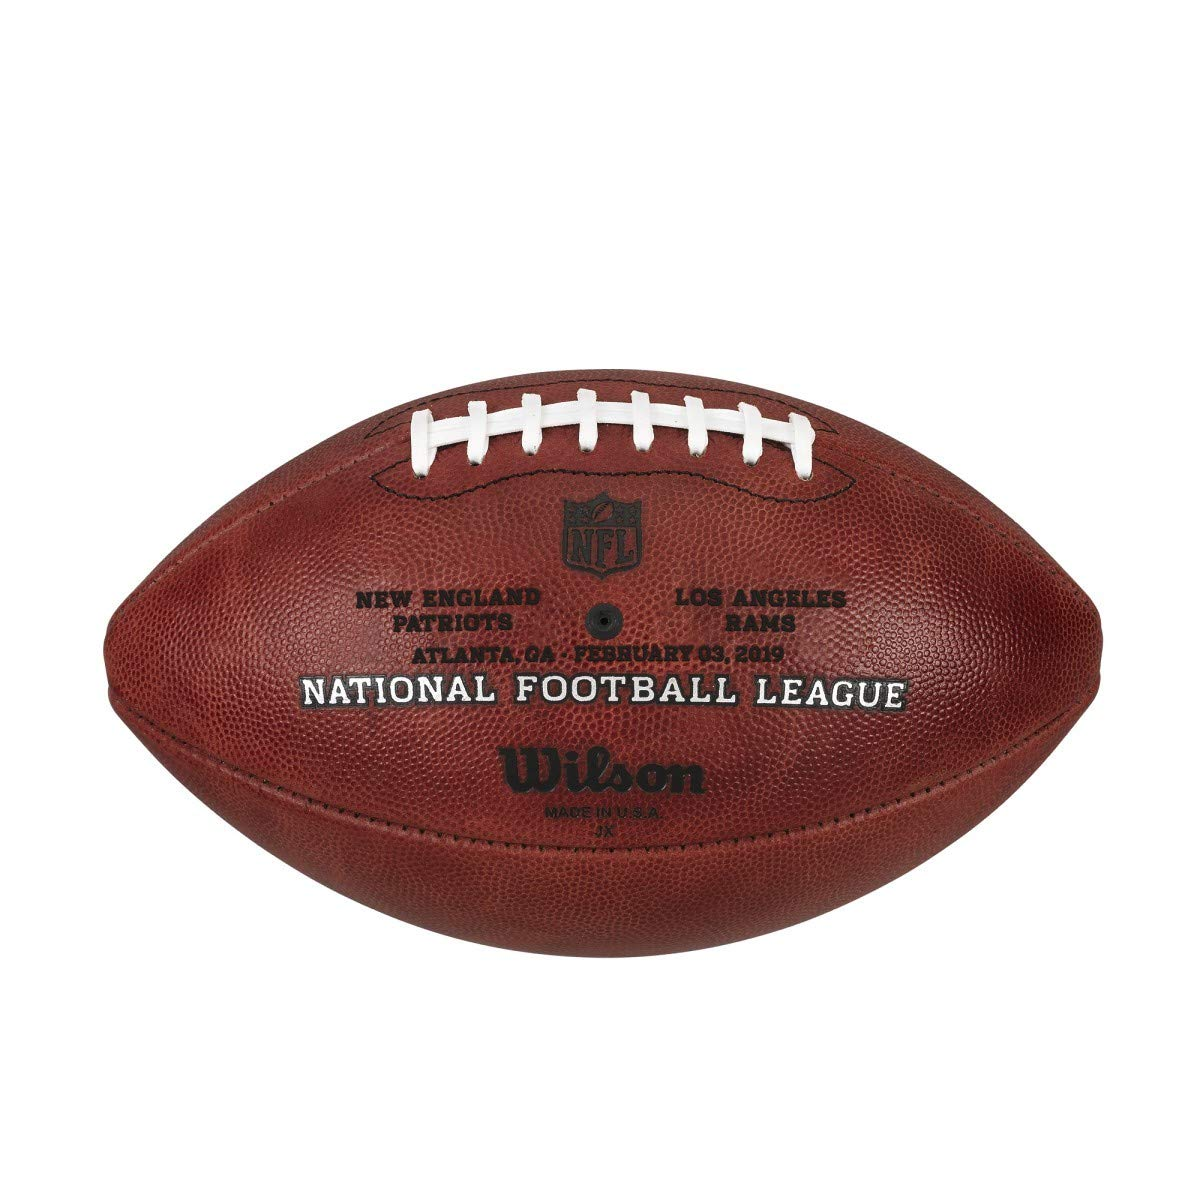 a8312253c29 Amazon.com   Wilson NFL Super Bowl LIII (53) Official Football New England  Patriots vs Los Angeles Rams   Sports   Outdoors